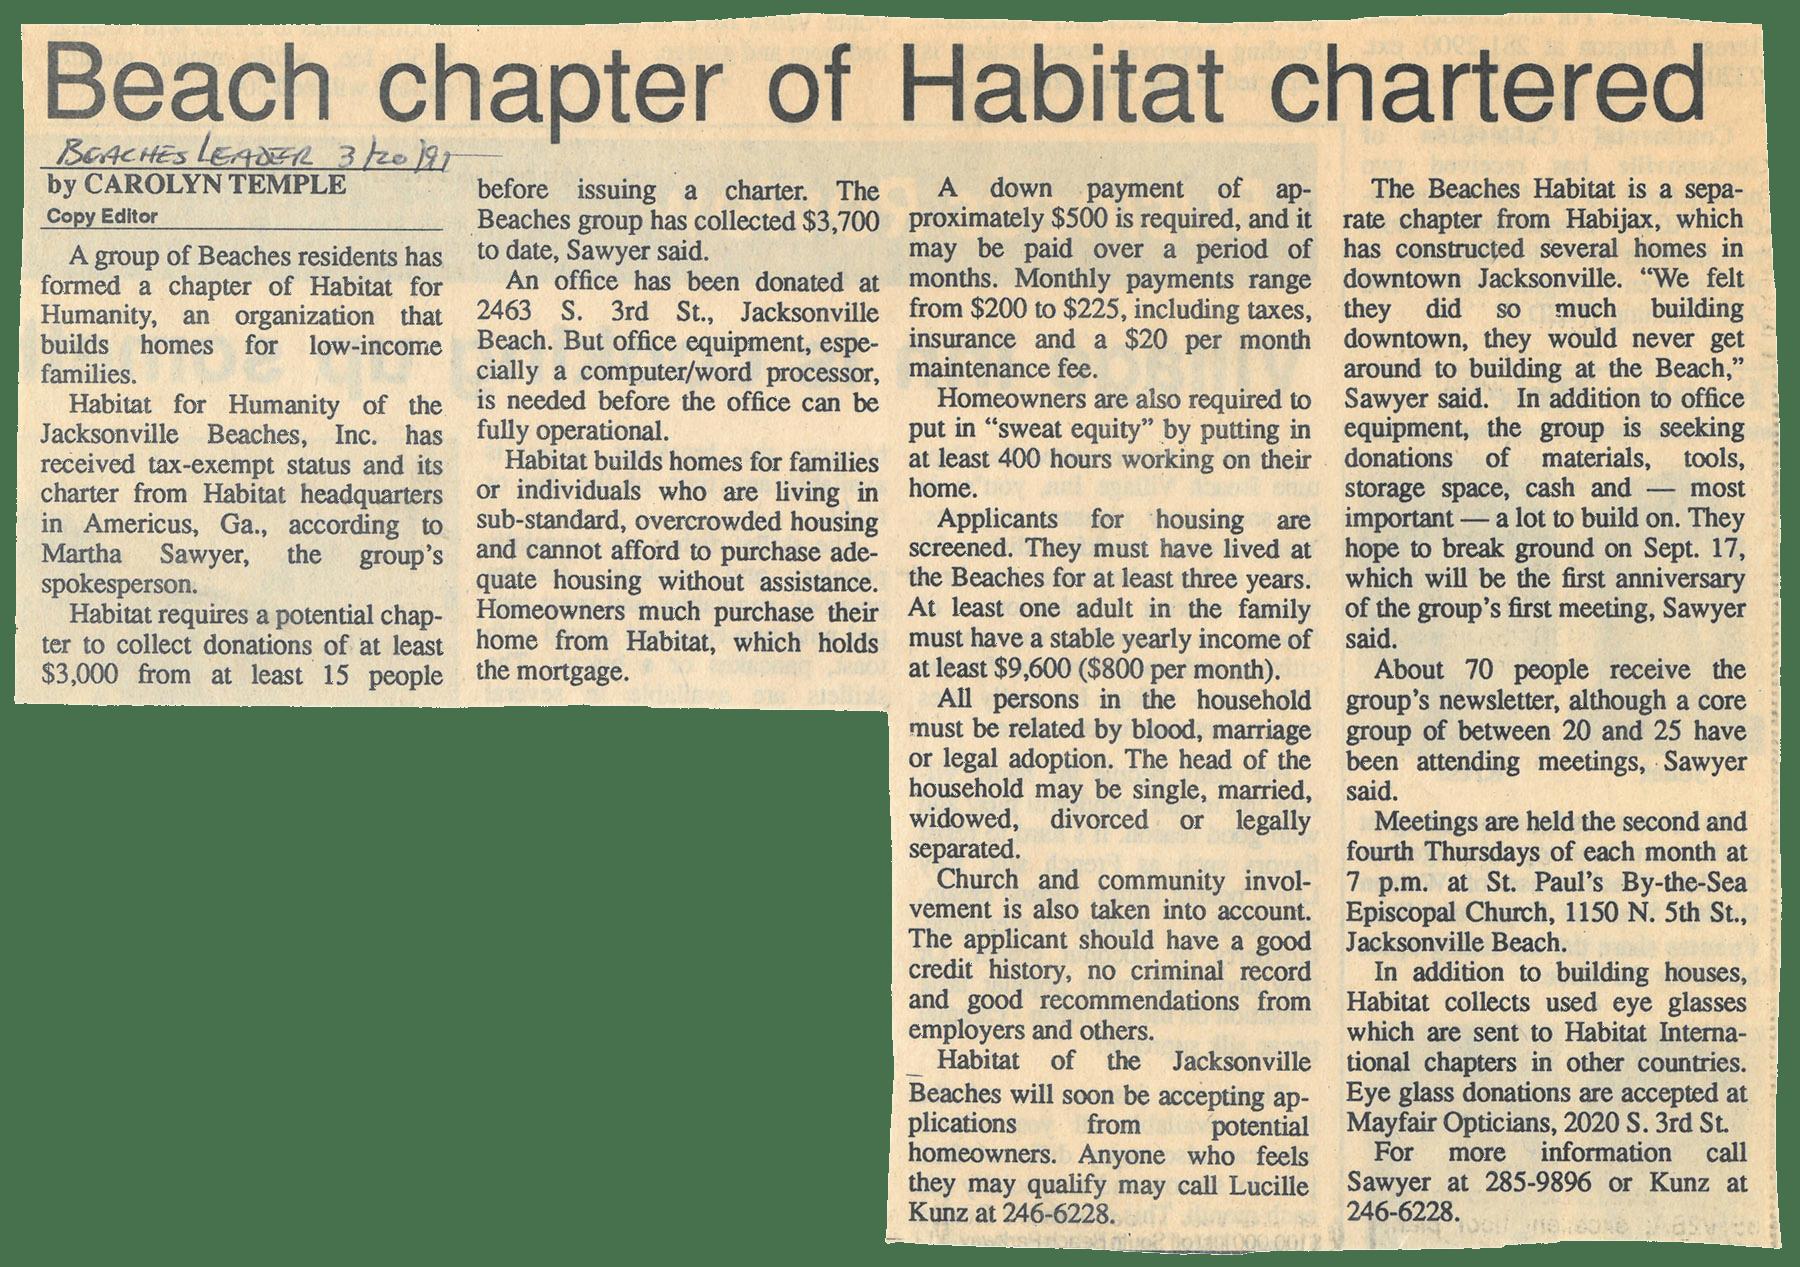 Beach chapter of Habitat chartered